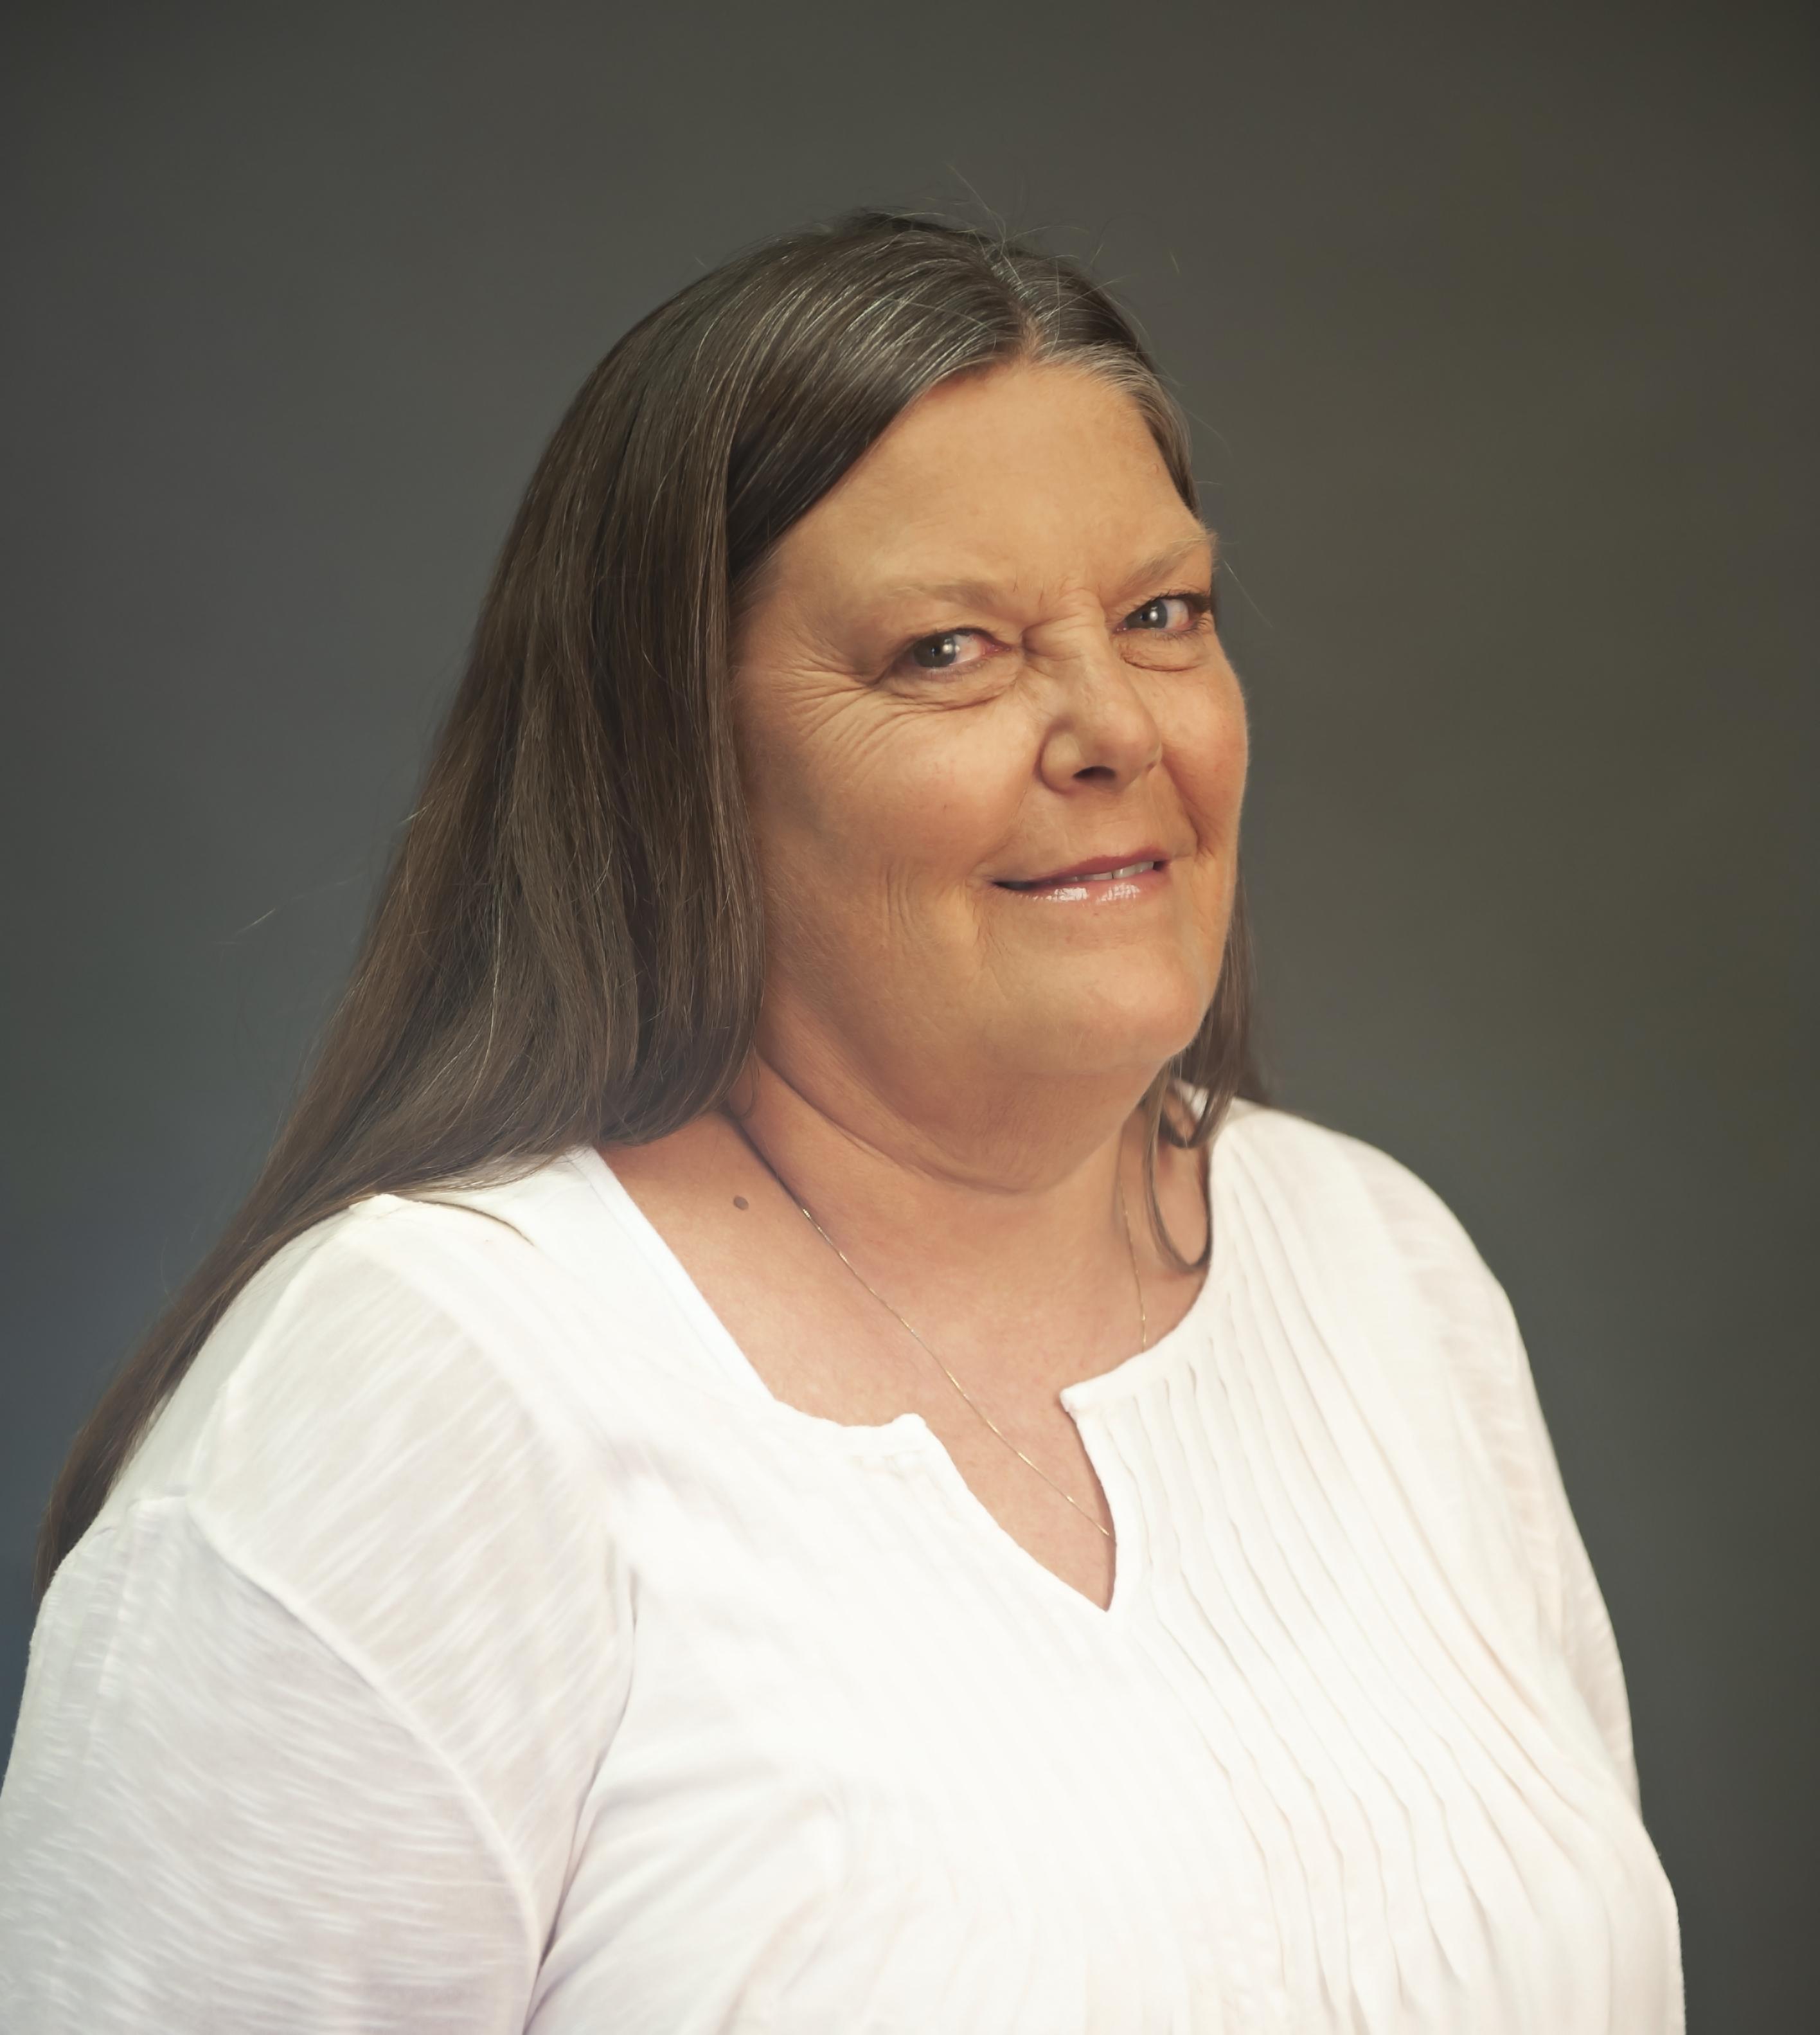 Our Team - Donna Stephens